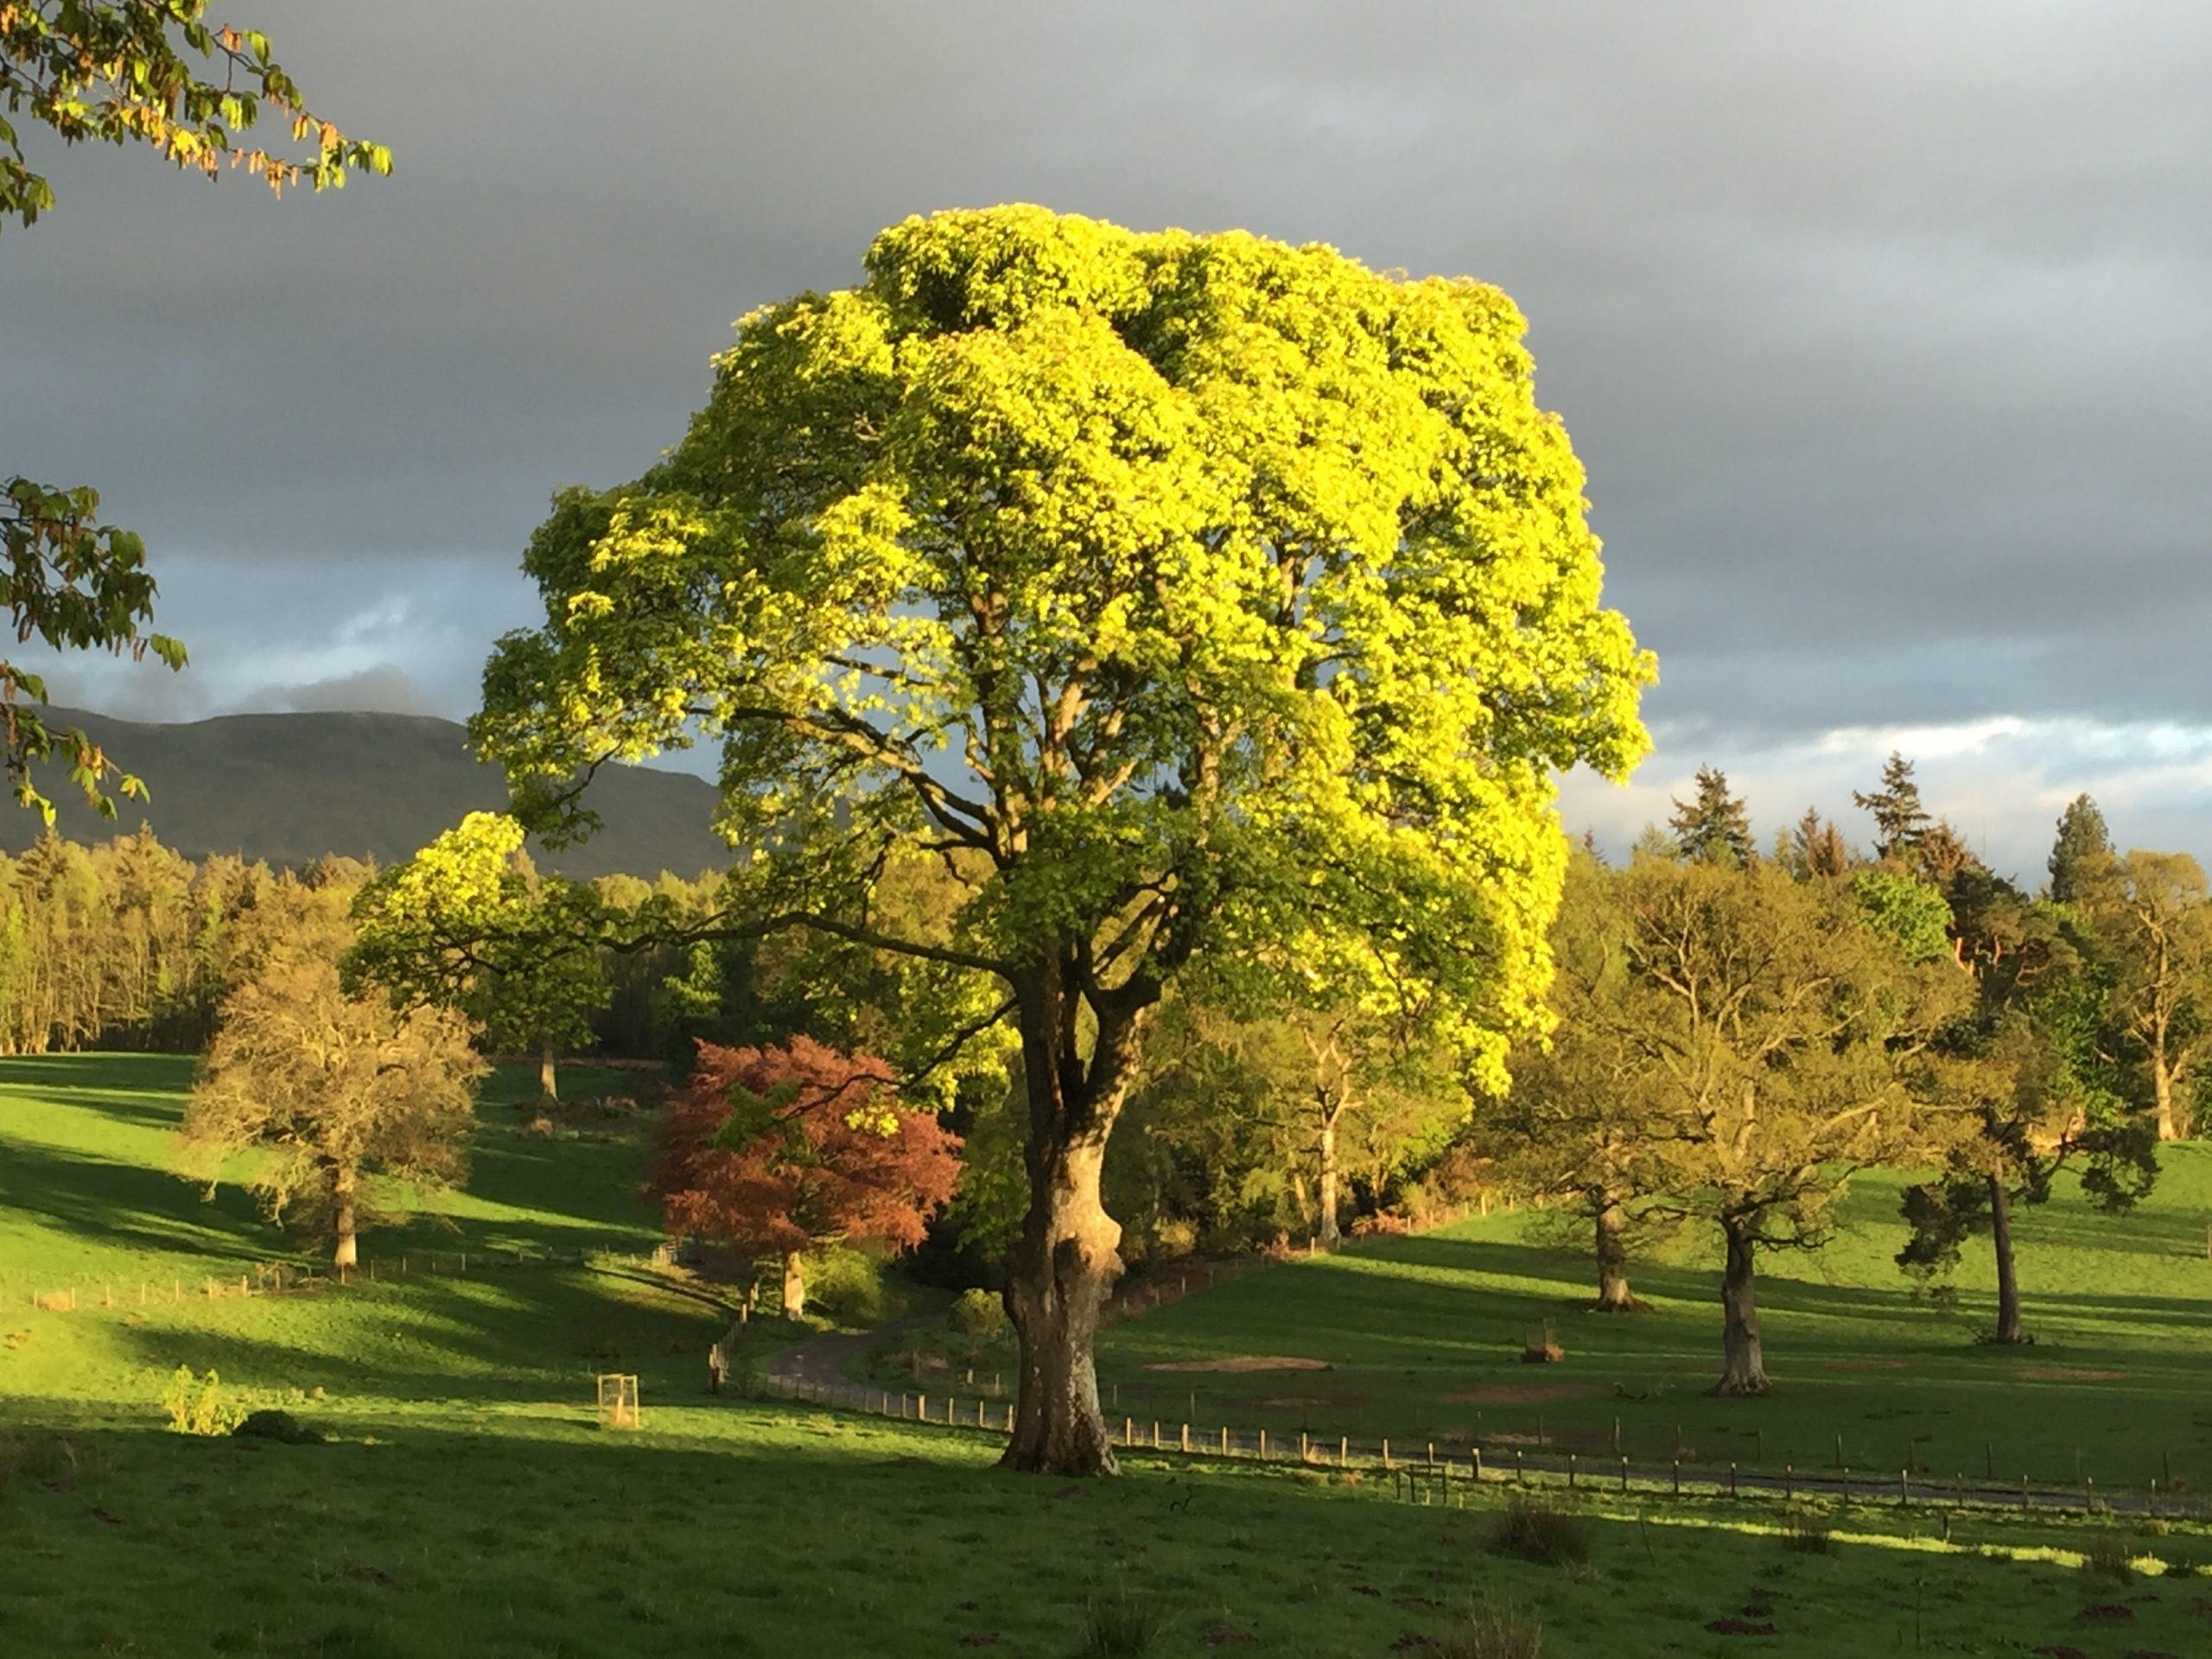 Scotland - Tree Identification Day